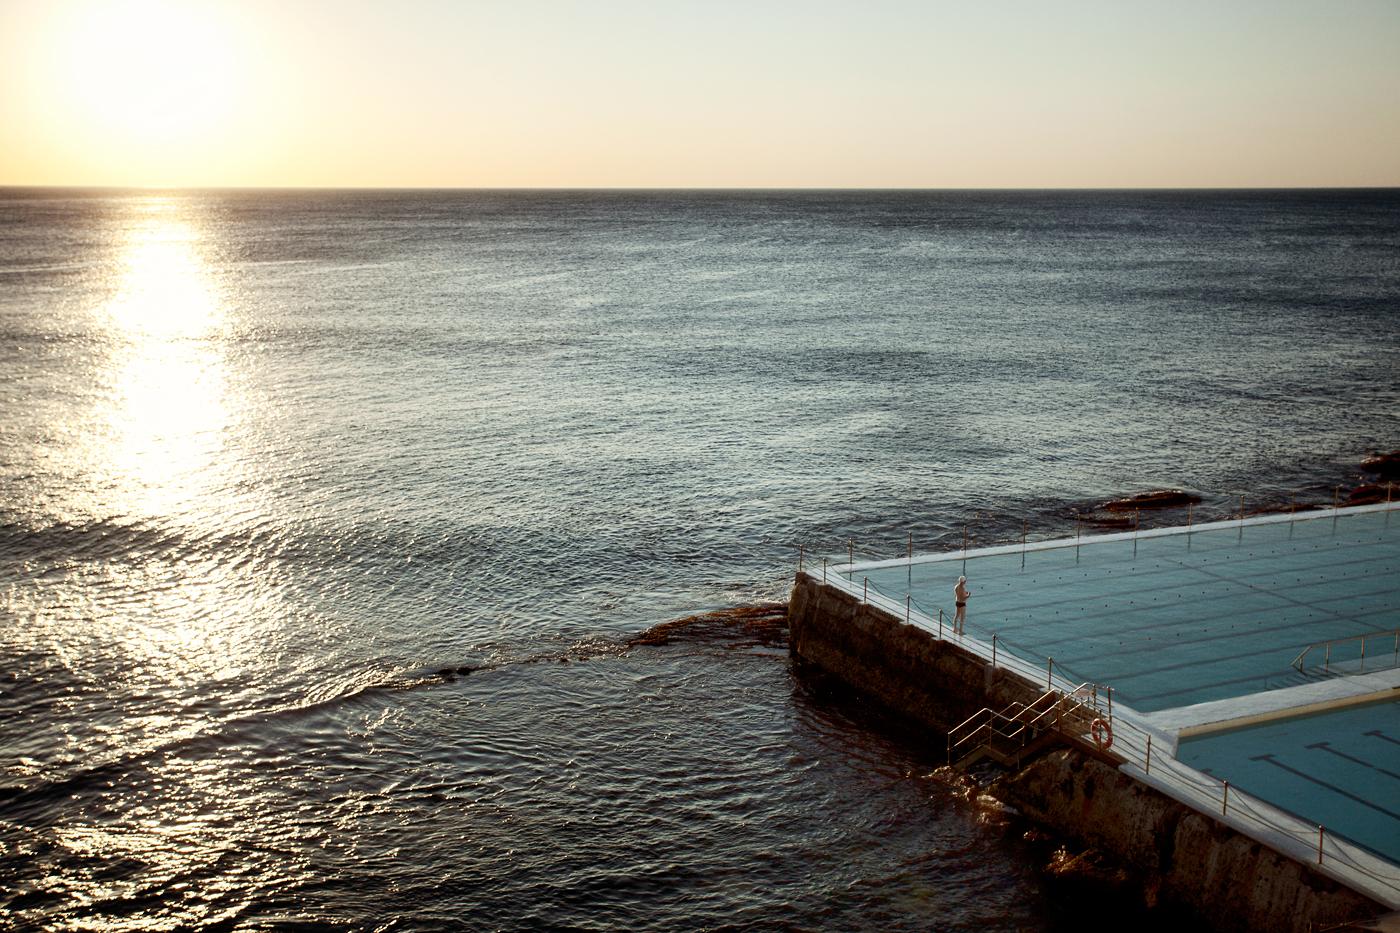 The most beautiful pool I have seen in my life at Bondi Beach Australia